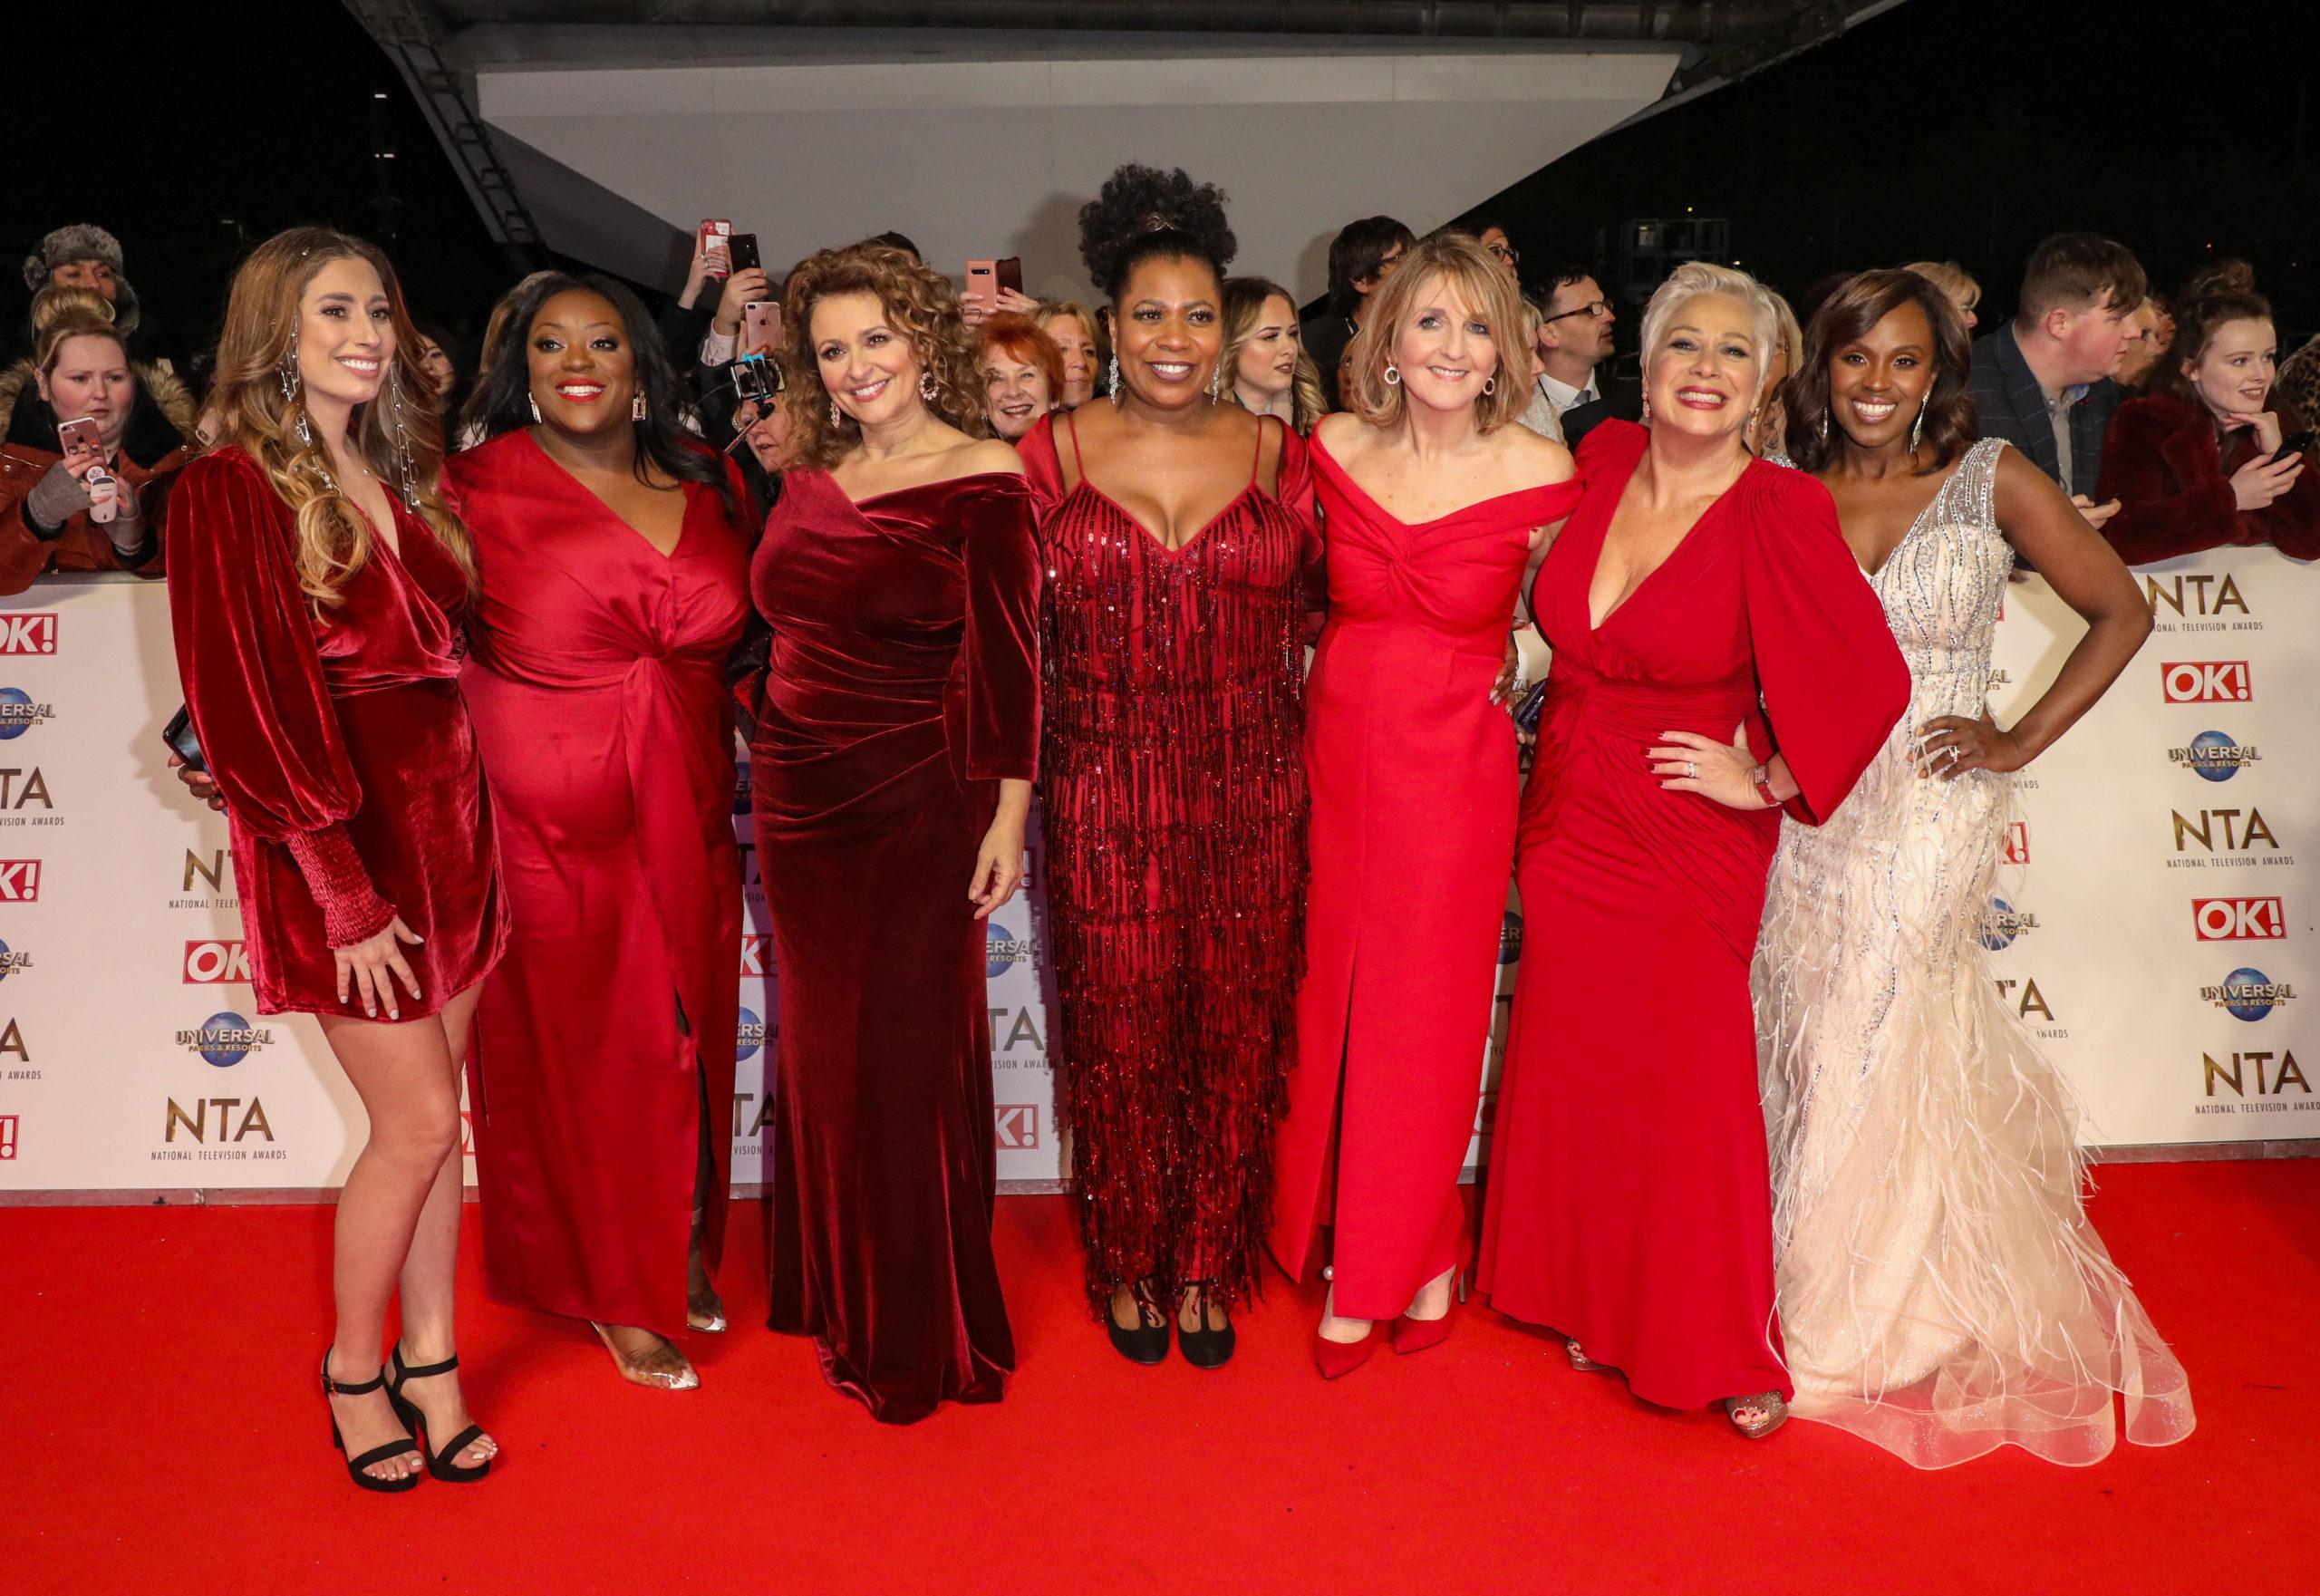 Loose Women's Nadia Sawalha with the cast